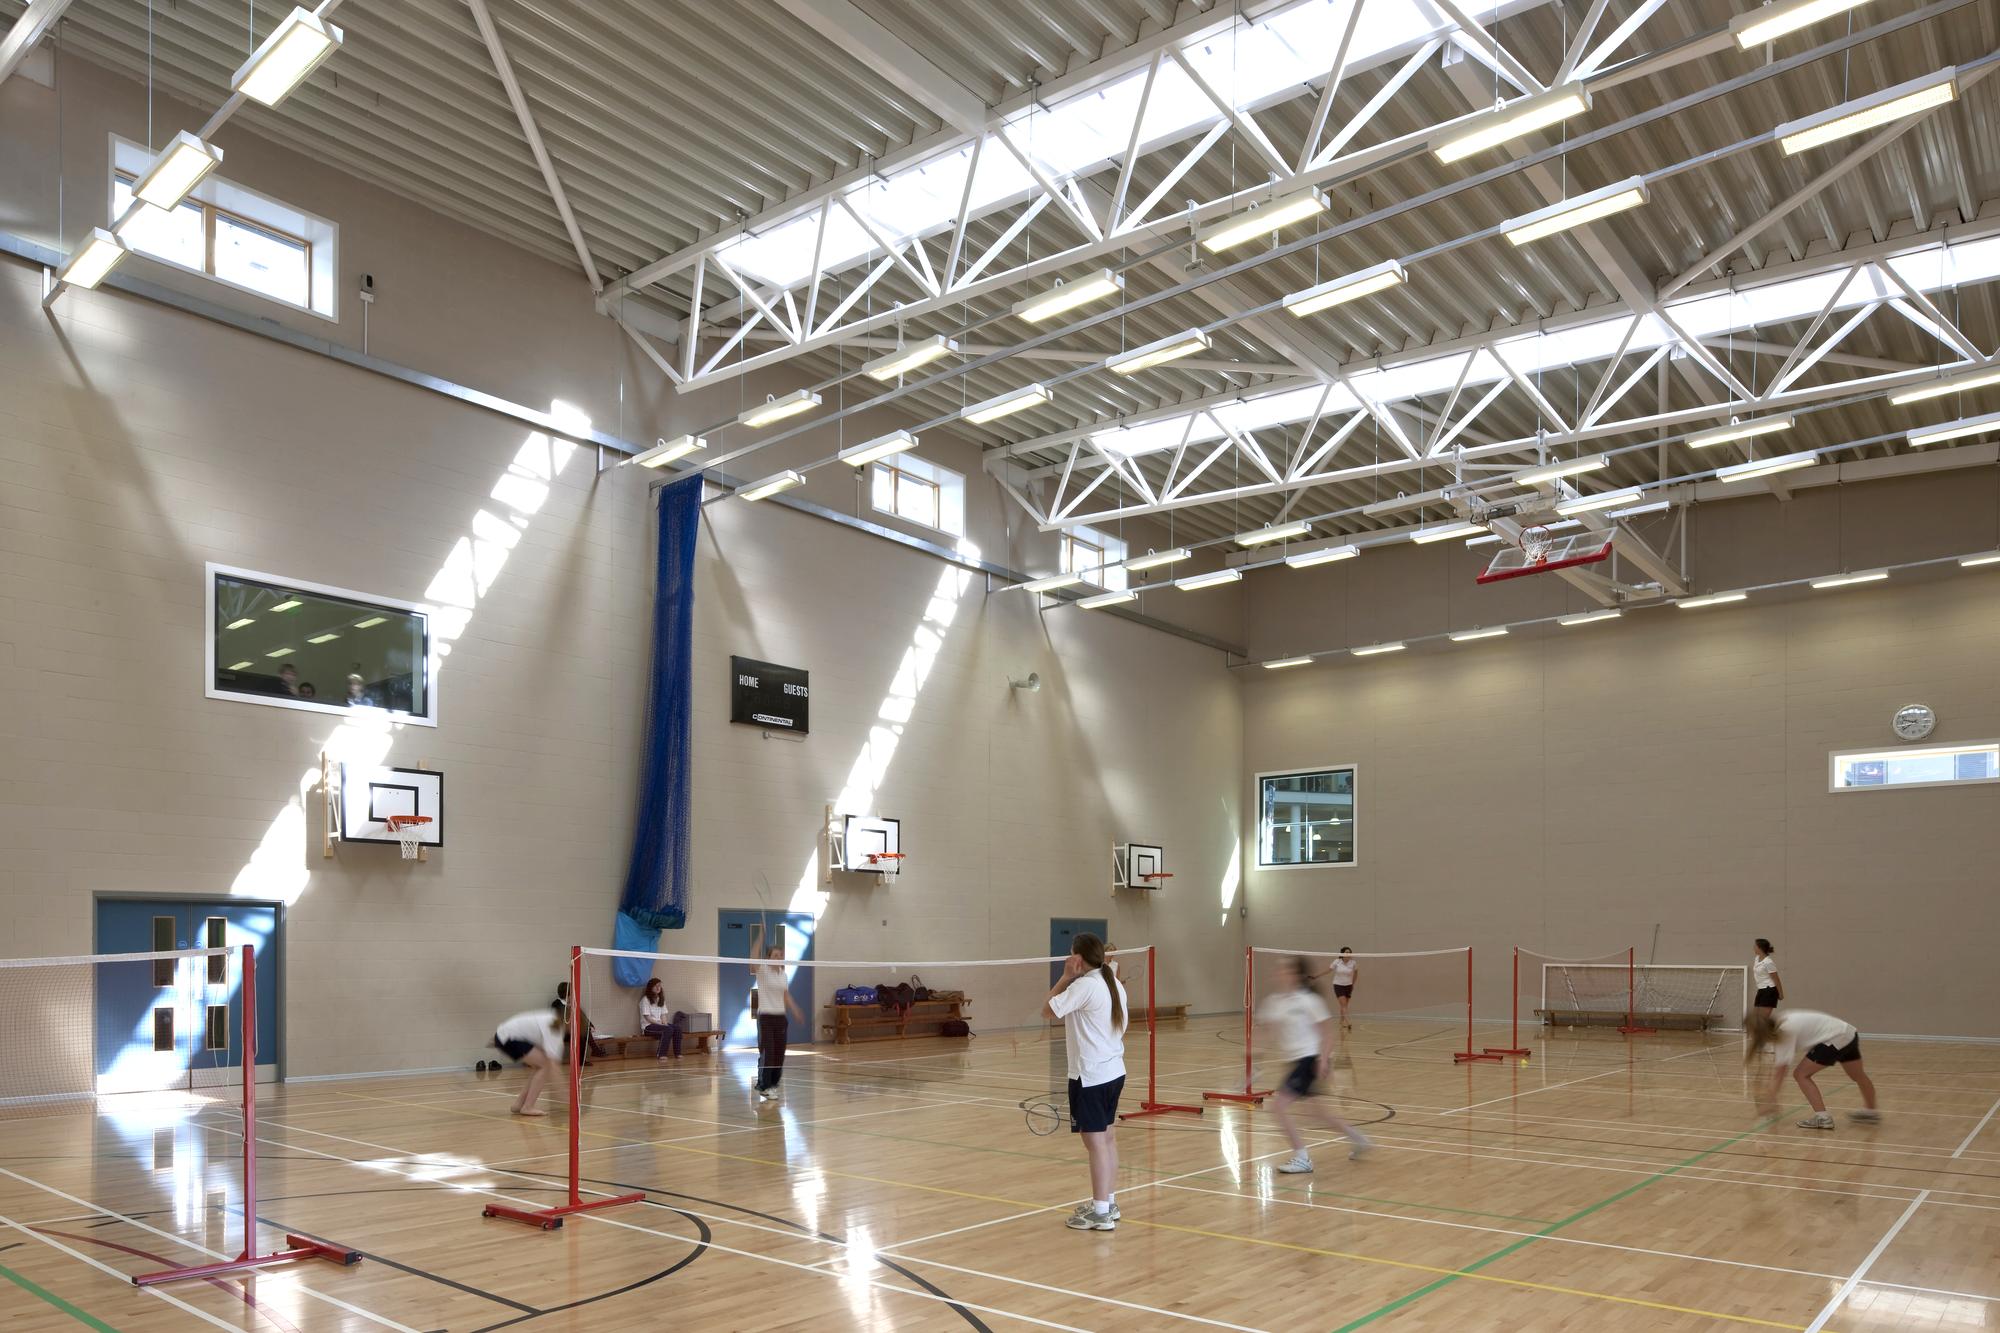 St John's School Marlborough / Re-Format LLP